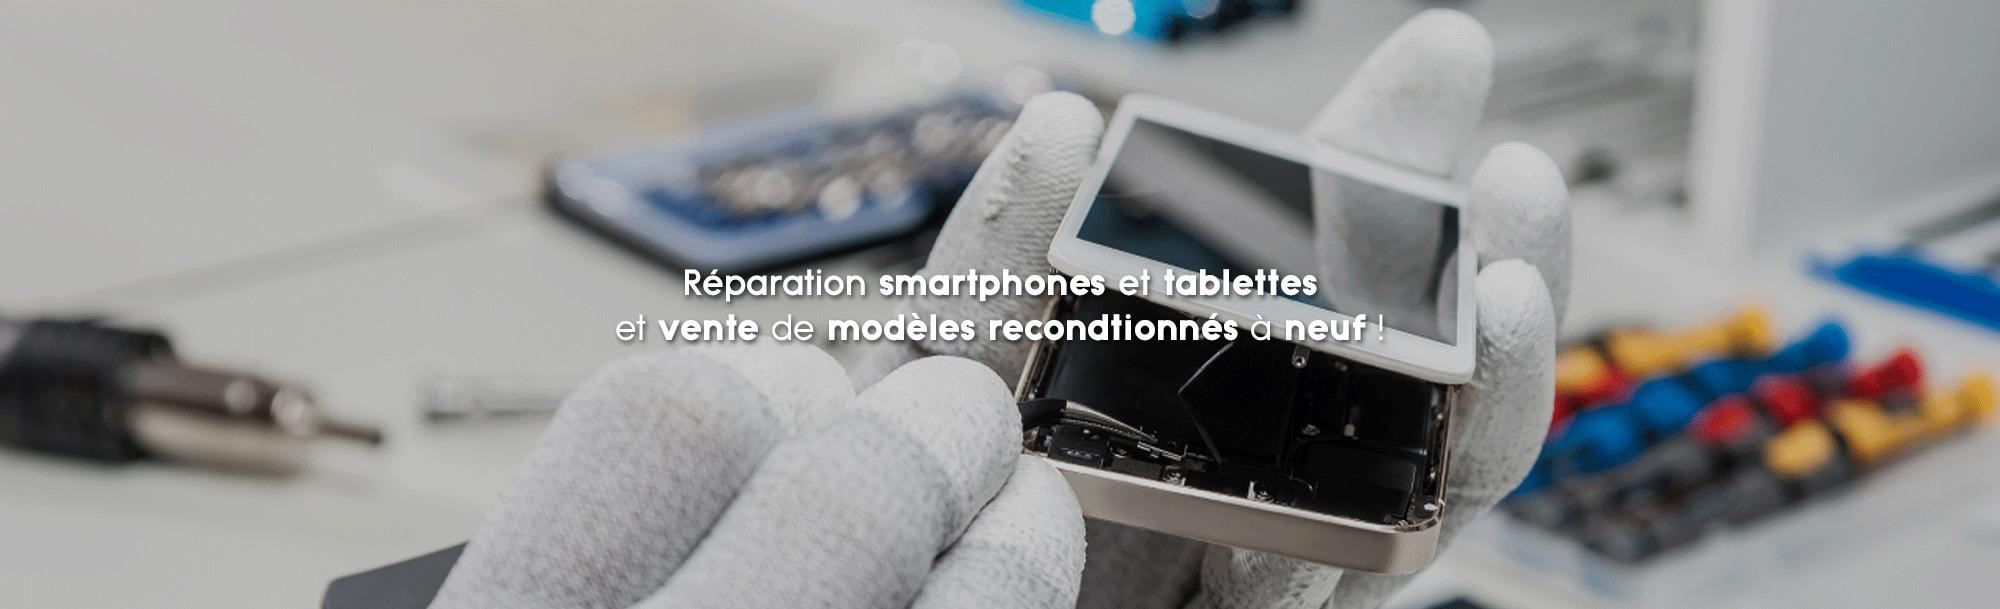 reparation smartphone andrezieux 42 prestaphone reparation telephones tablettes. Black Bedroom Furniture Sets. Home Design Ideas